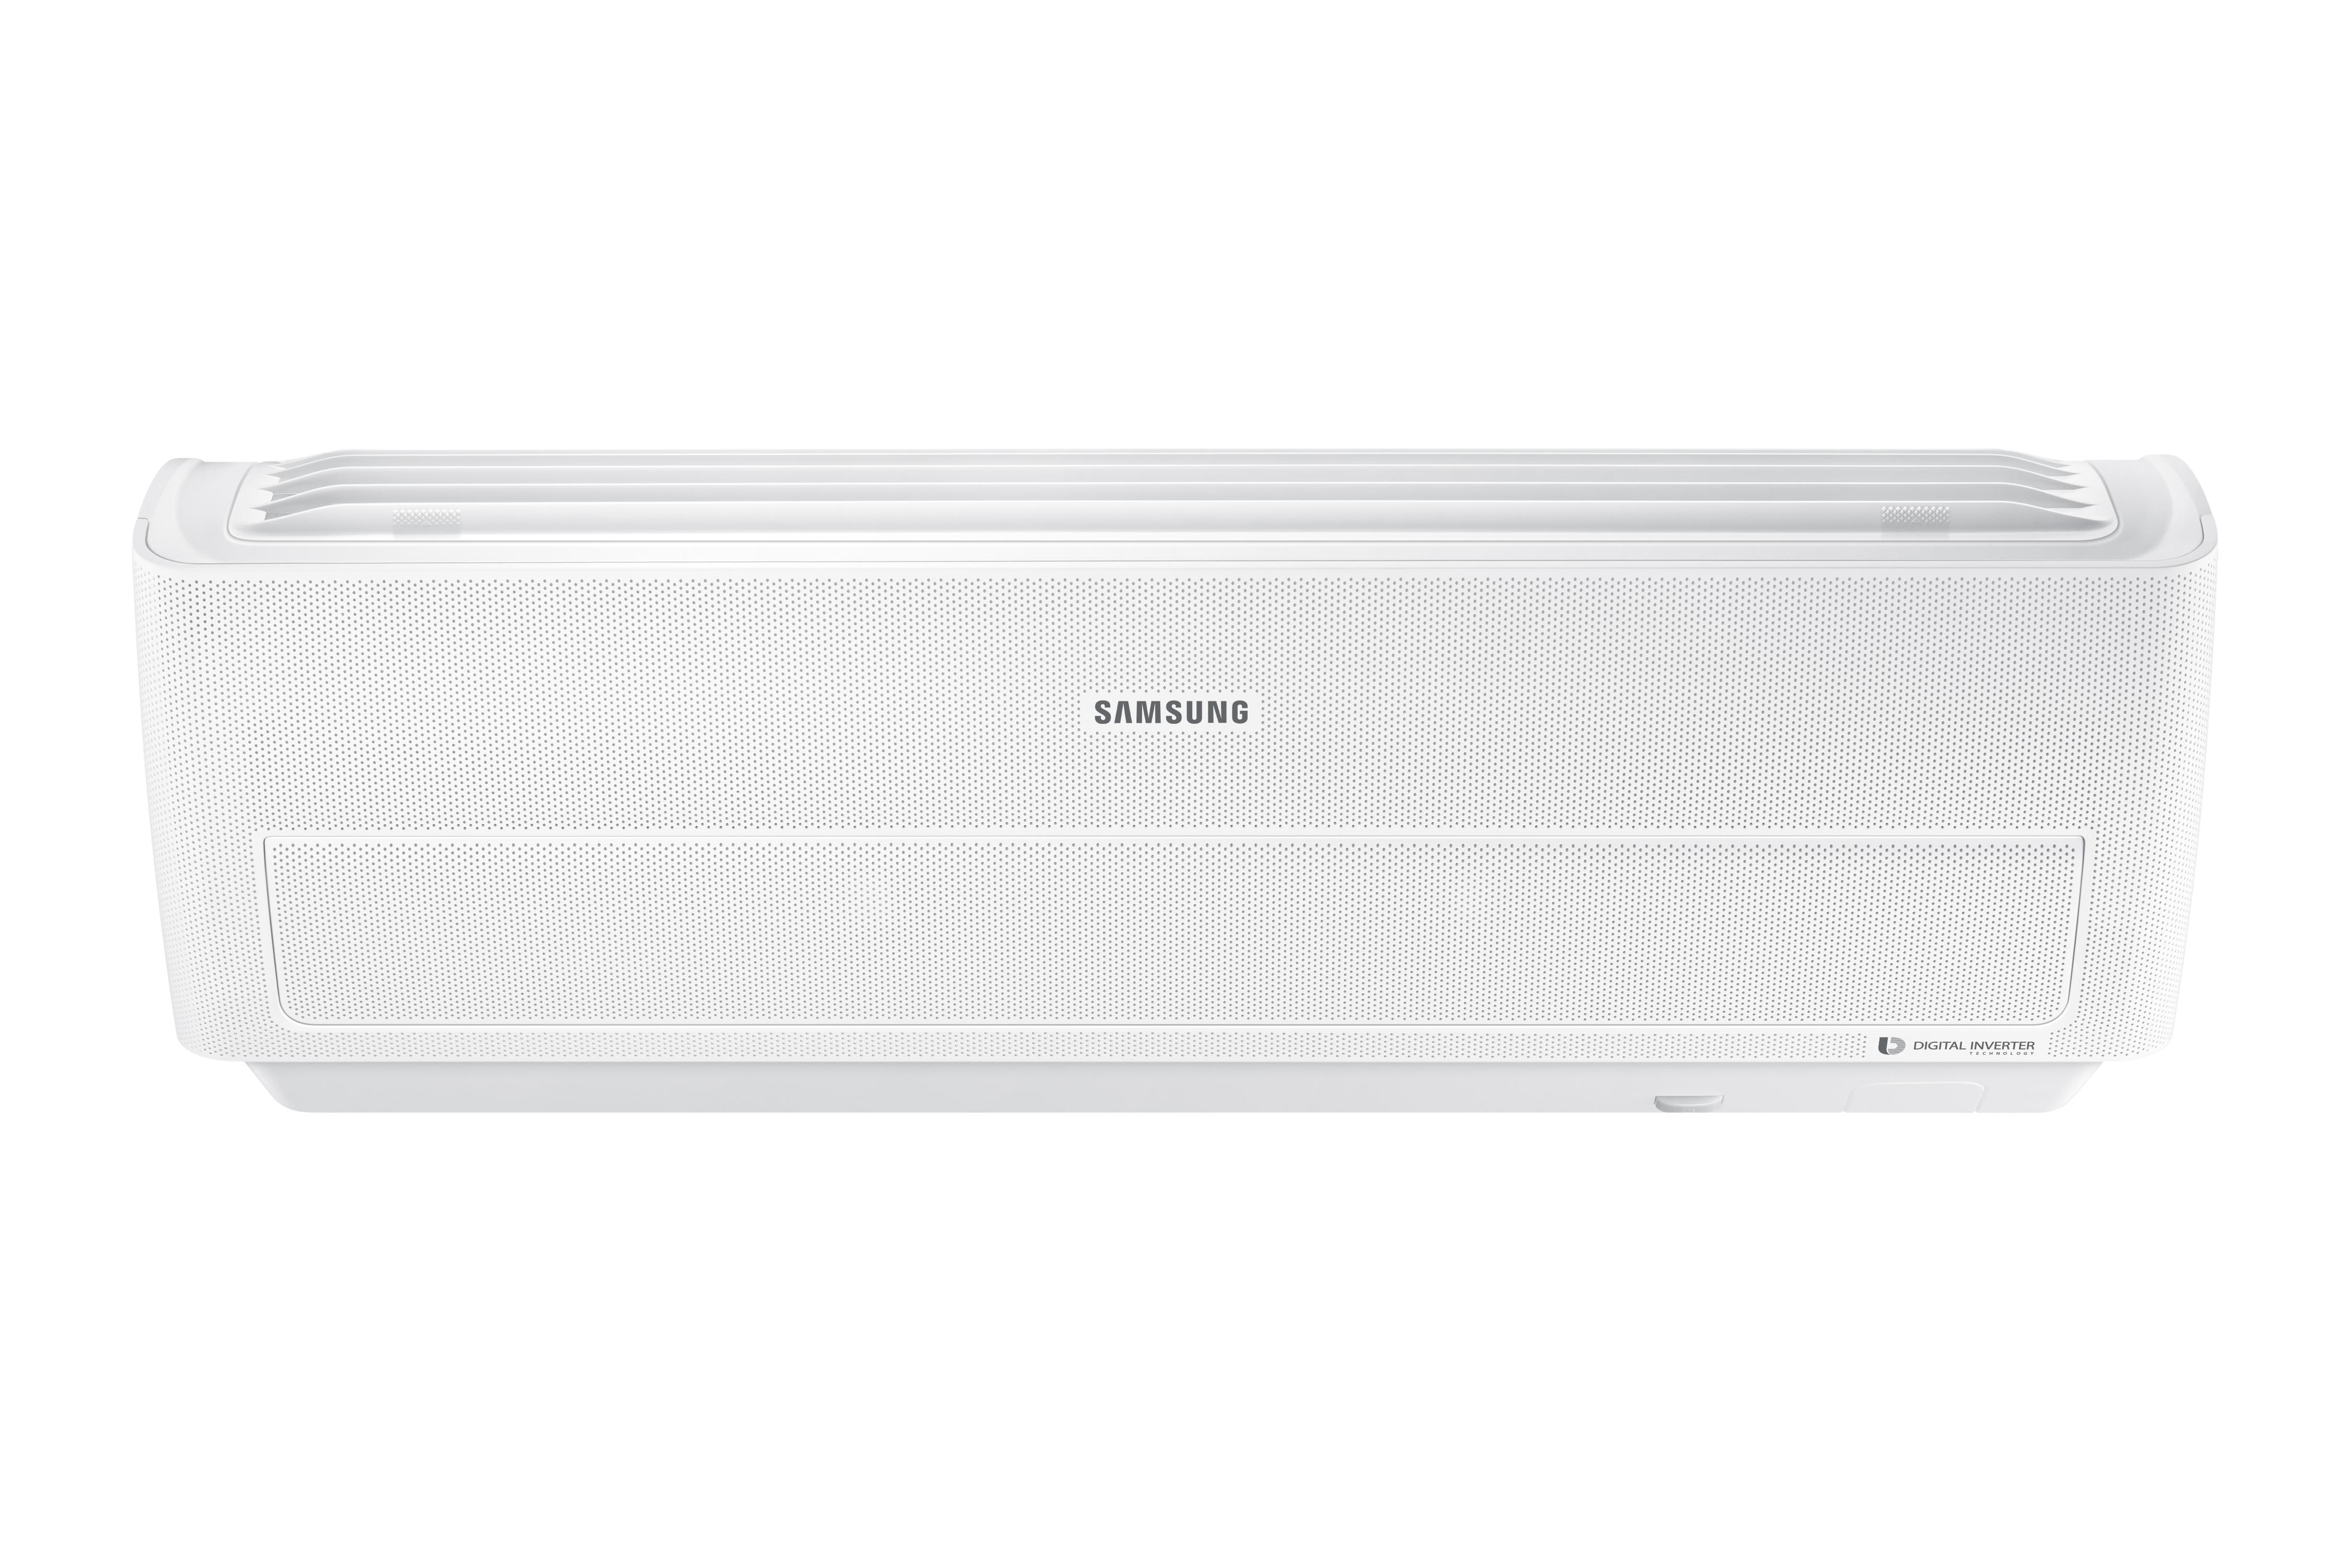 Samsung Wind-Free wandmodel airconditioning